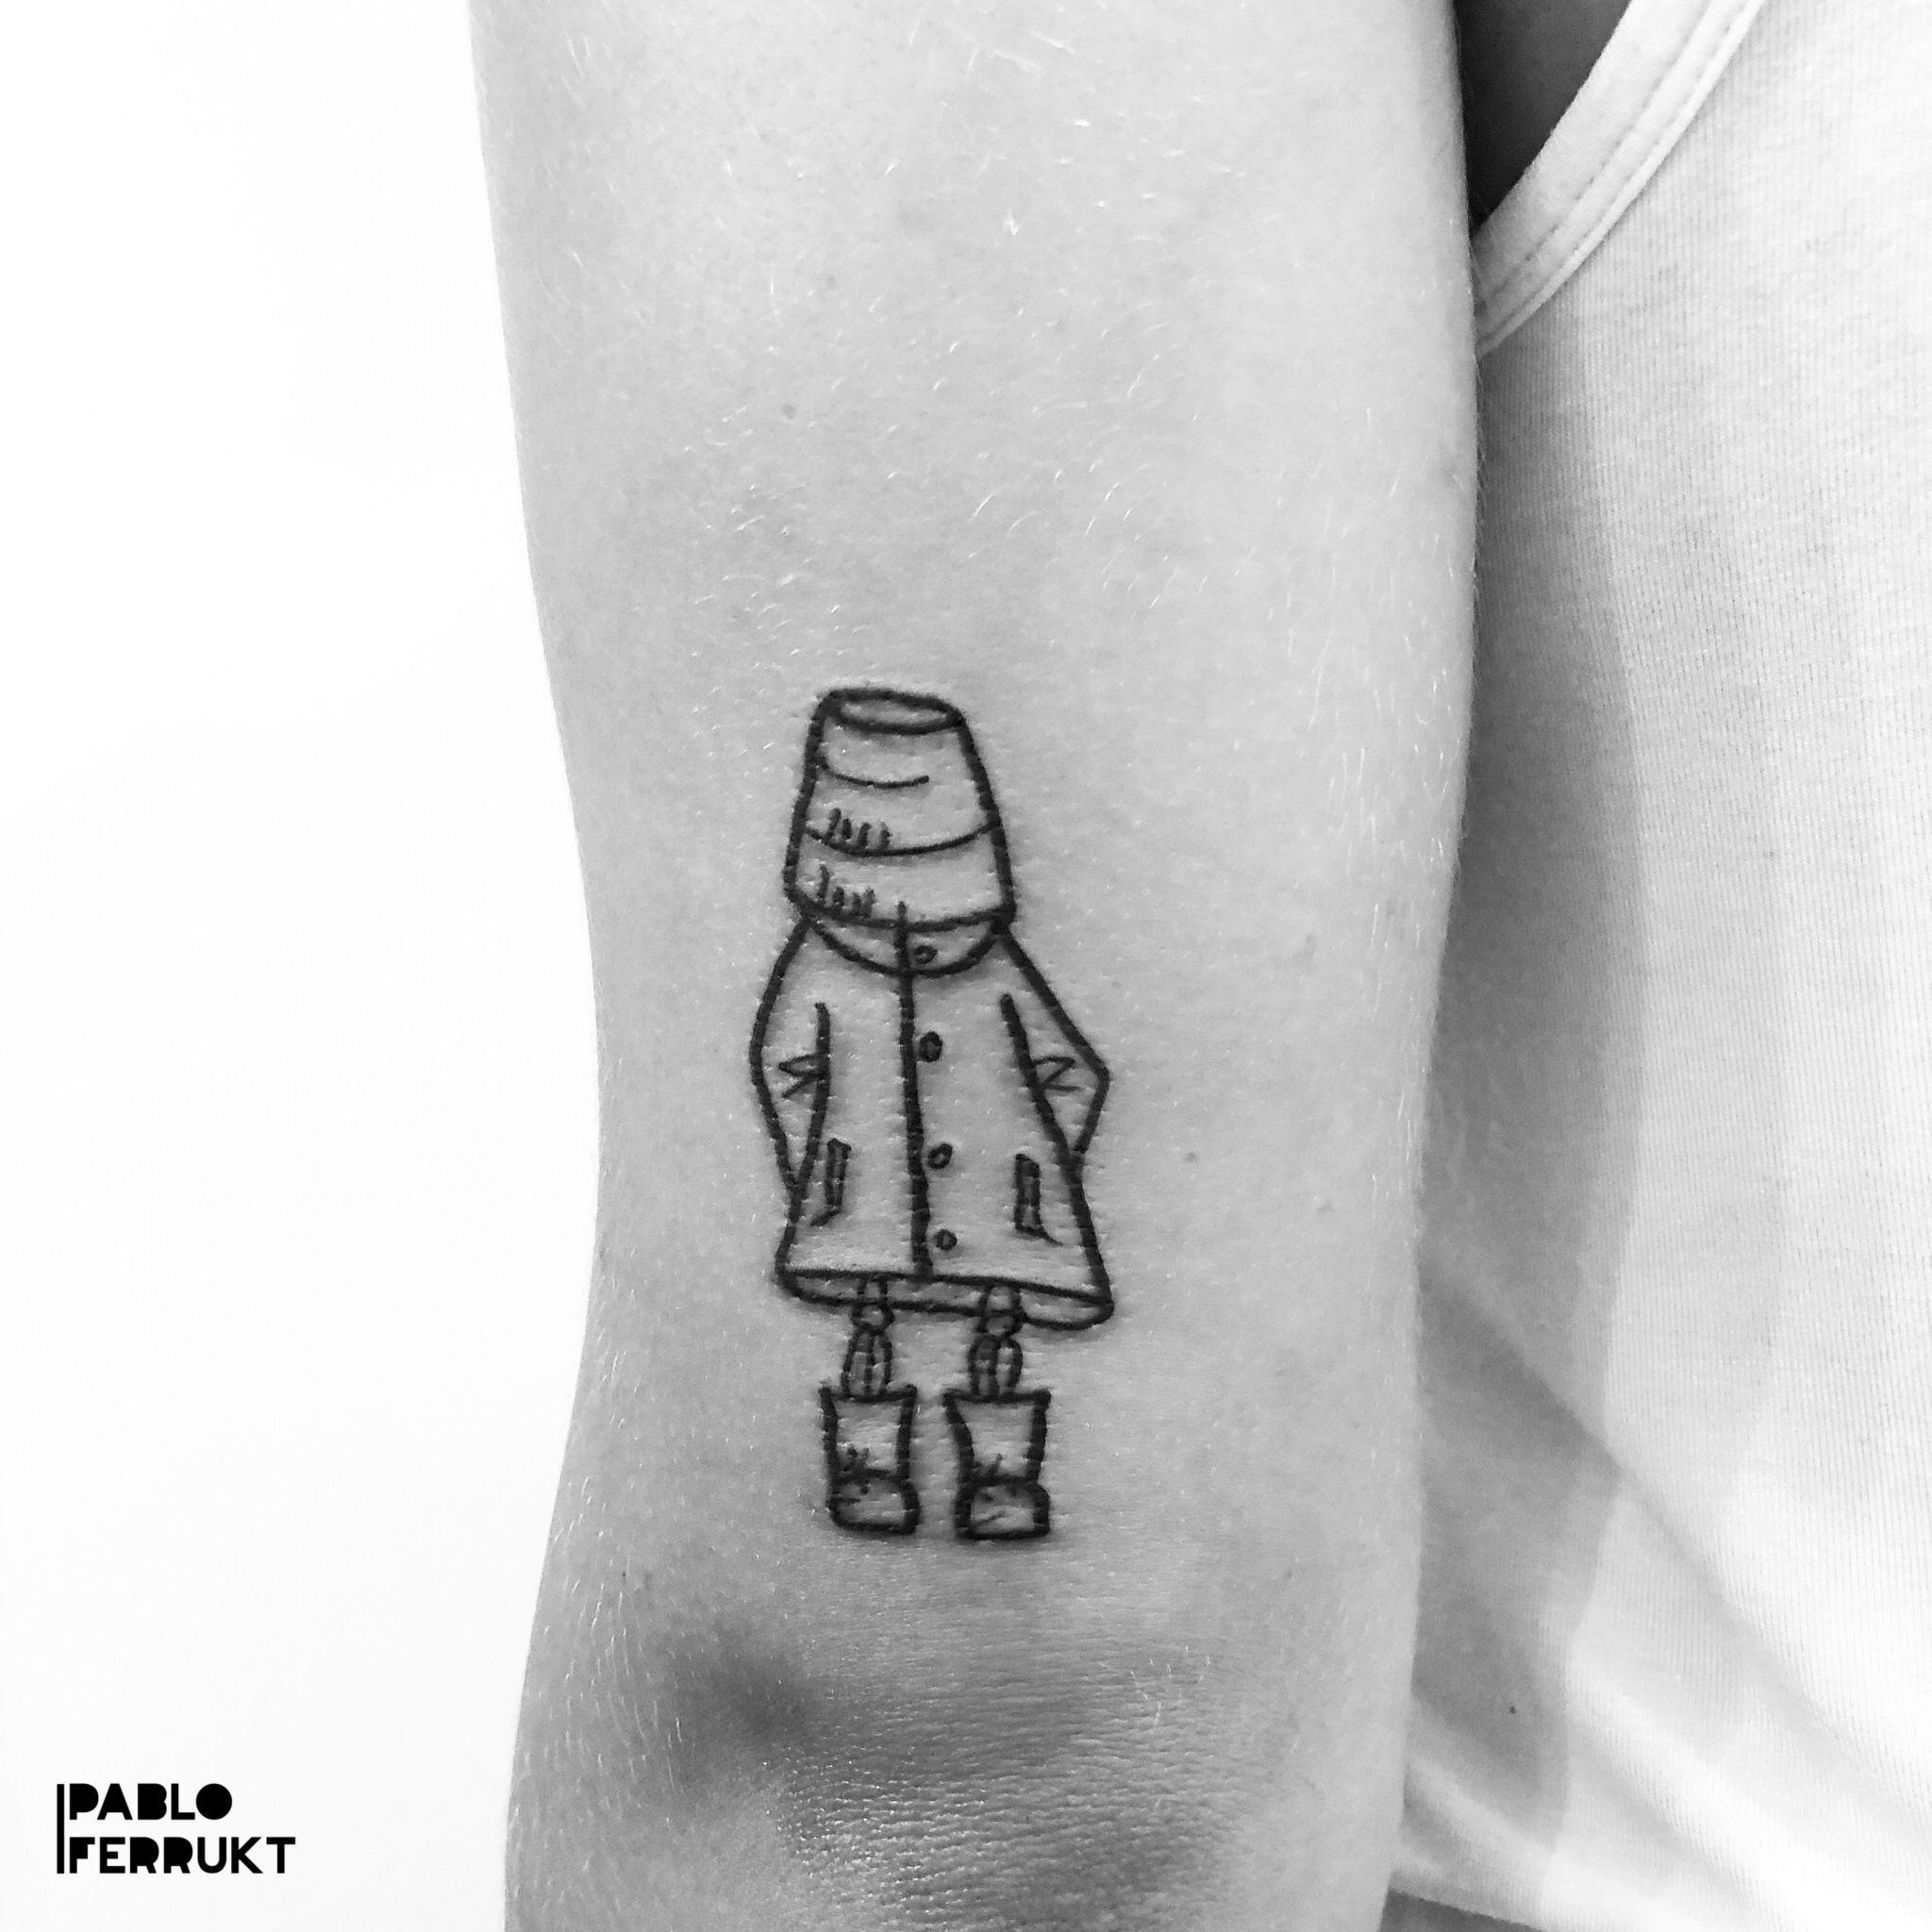 Done yesterday for Lucy, thanks so much!  I am till the 19.08 at @lobster.tattoo, (Split, Croatia)  📍08-09.09 at @szczecintattooconvention, (Stettin. Poland) 📍11-15.09 at @taetowiermanufaktur, (Wuppertal, Deutschland)  Resident in Berlin at @amor_de_madre_berlin.  Appointments at pabloferrukt@icloud.com or DM.⠀ #tattoo . . . .  #tattoos #tat #ink #inked #tattooed #tattoist #art #design #instaart #geometrictattoos #walkindwelcomed #tatted #instatattoo #bodyart #tatts #tats #amazingink #tattedup #inkedup #berlin #berlintattoo #poland #stettin #berlintattoos #skeletontattoo #red  #wuppertal #splitcroatia